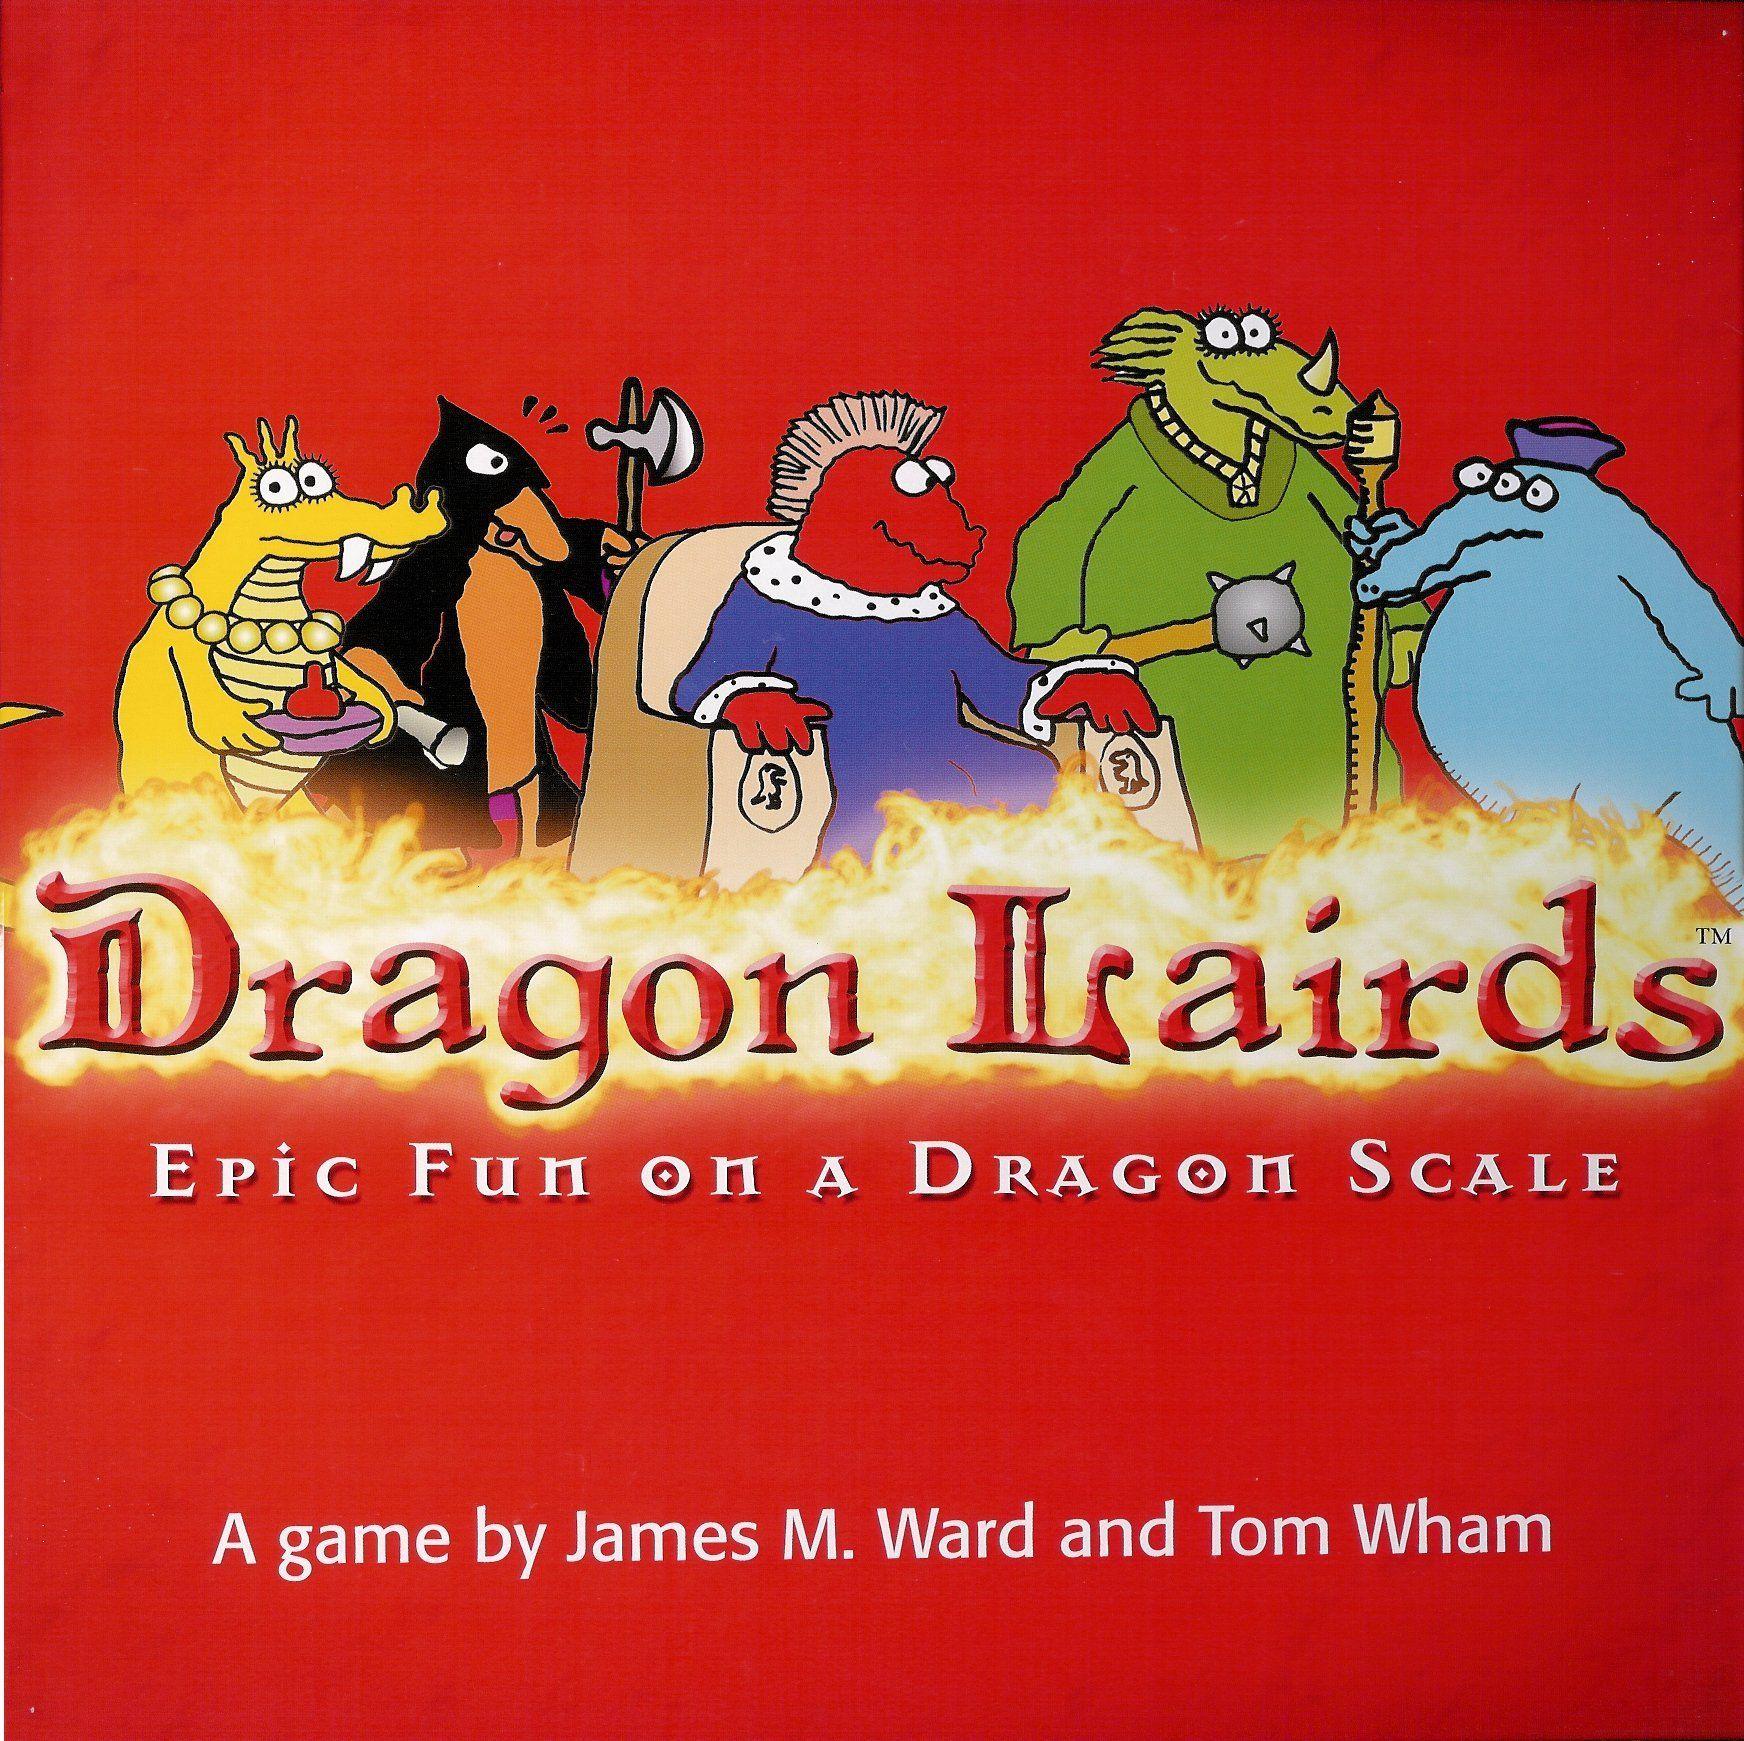 Dragon Lairds